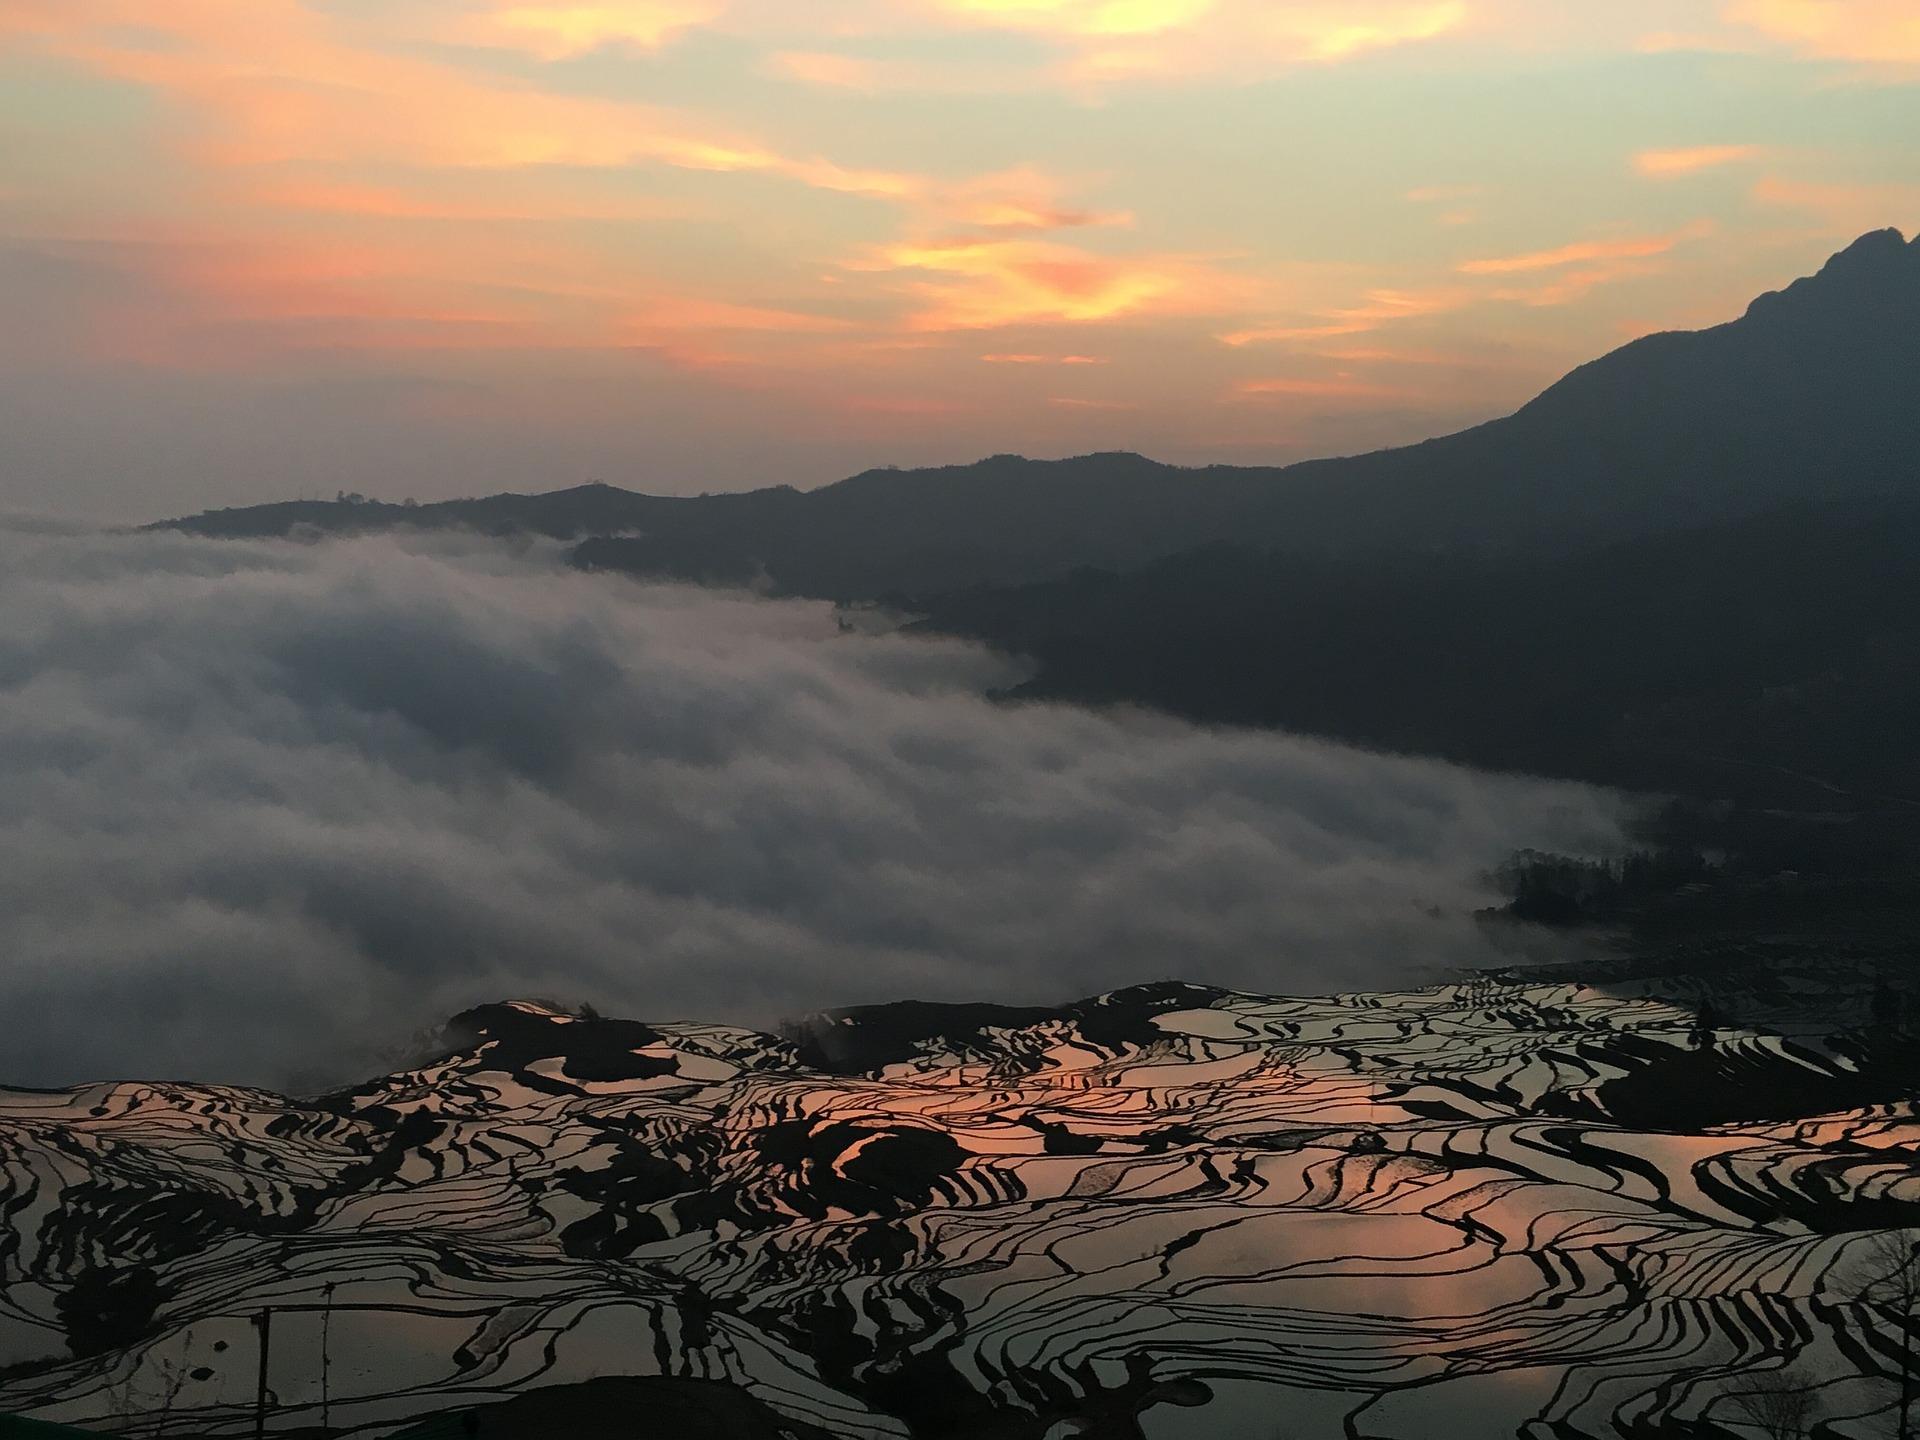 yuanyang-rice-terraces-2374300_1920.jpg